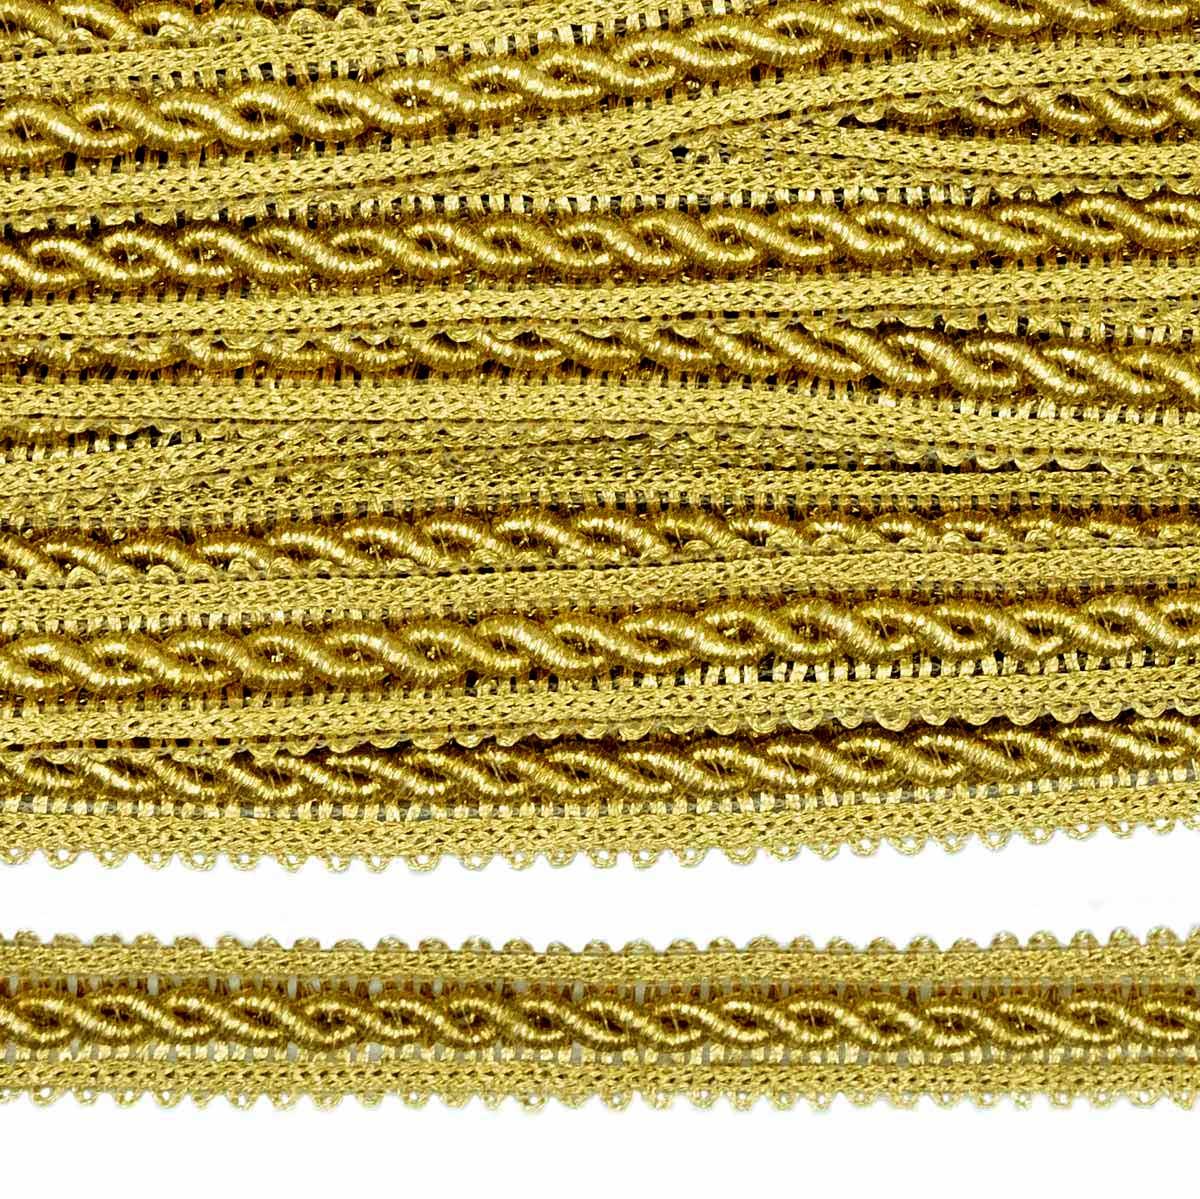 23-1098 Тесьма метал.14мм. ГР